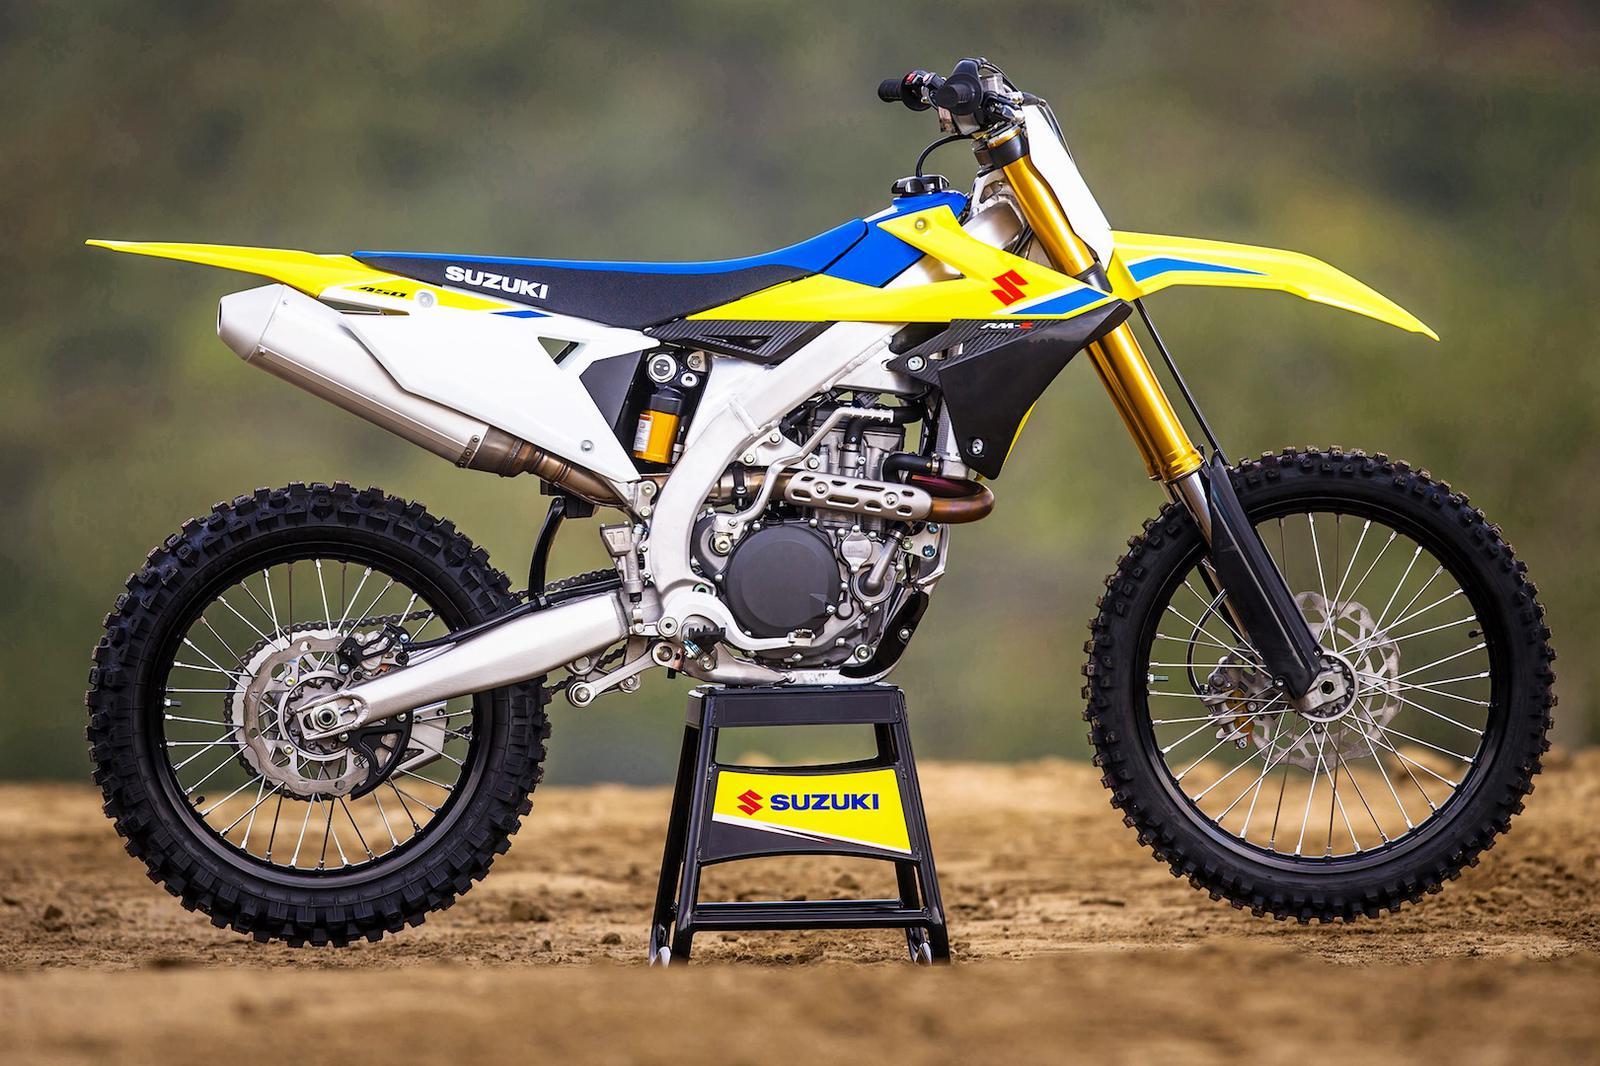 2018-Suzuki-RM-Z450-First-Look-Motocross-Motorcycl